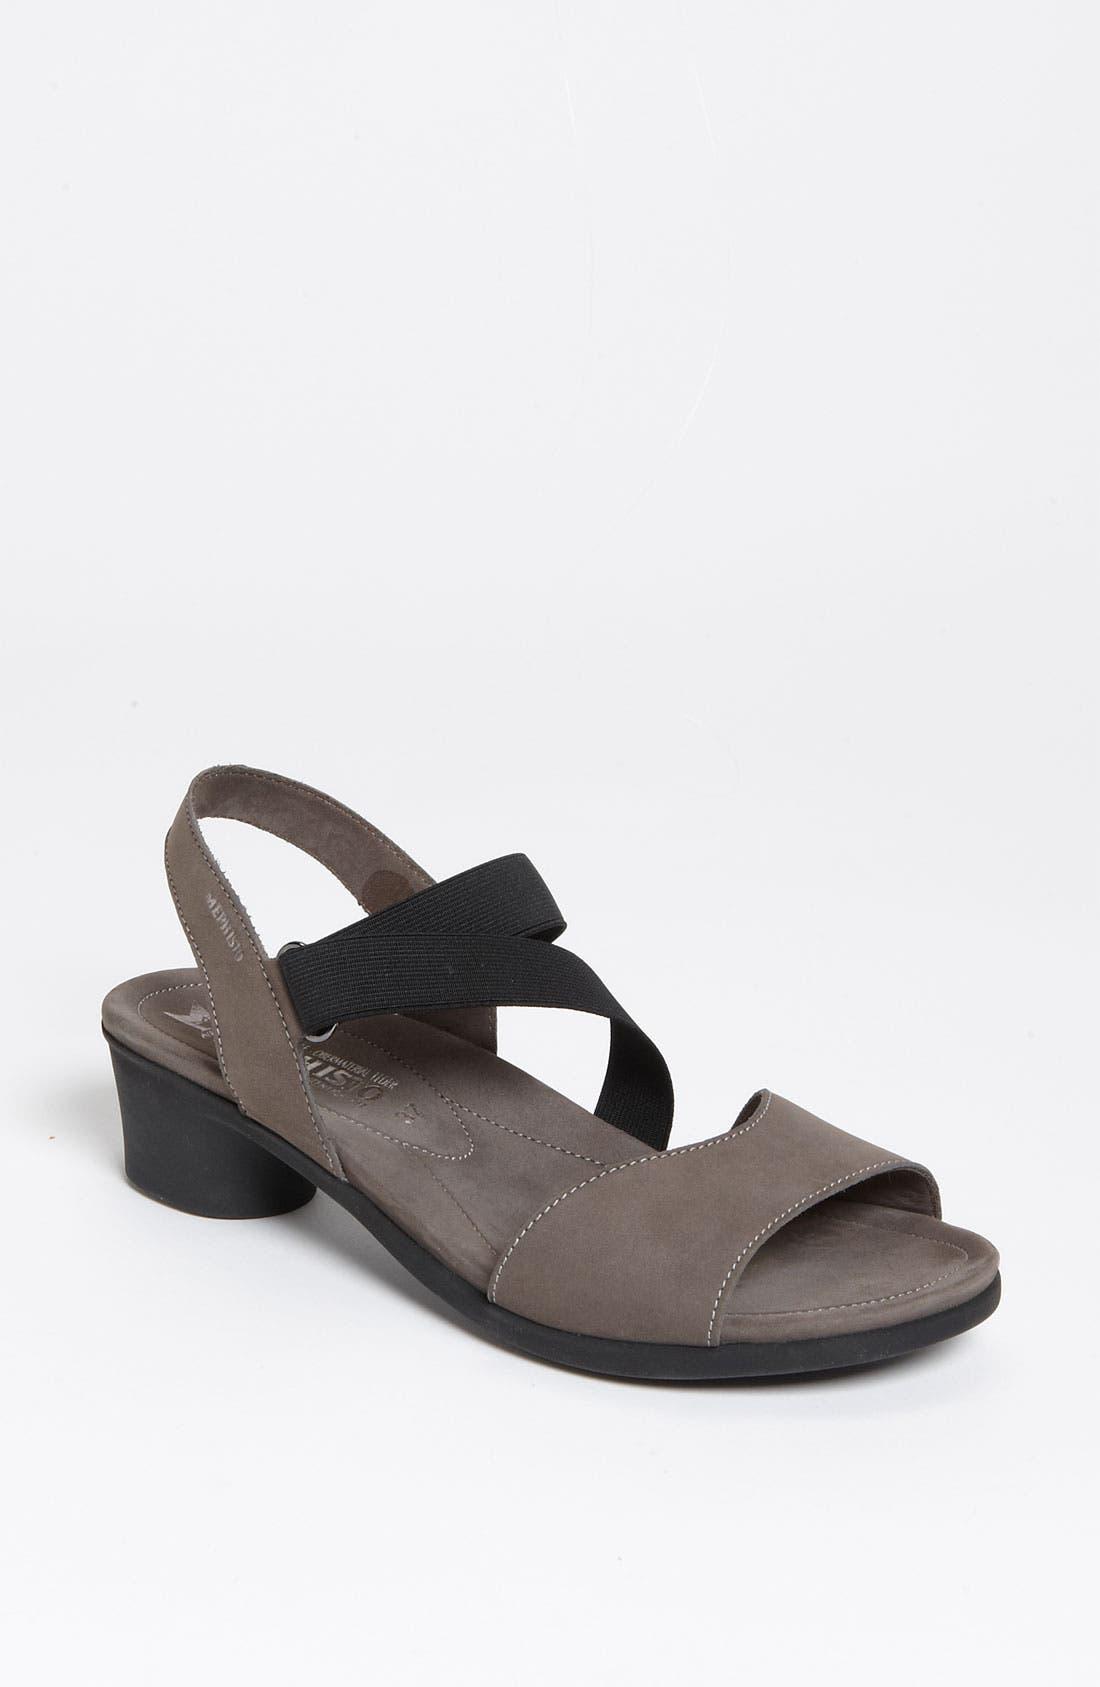 Main Image - Mephisto 'Priska' Sandal